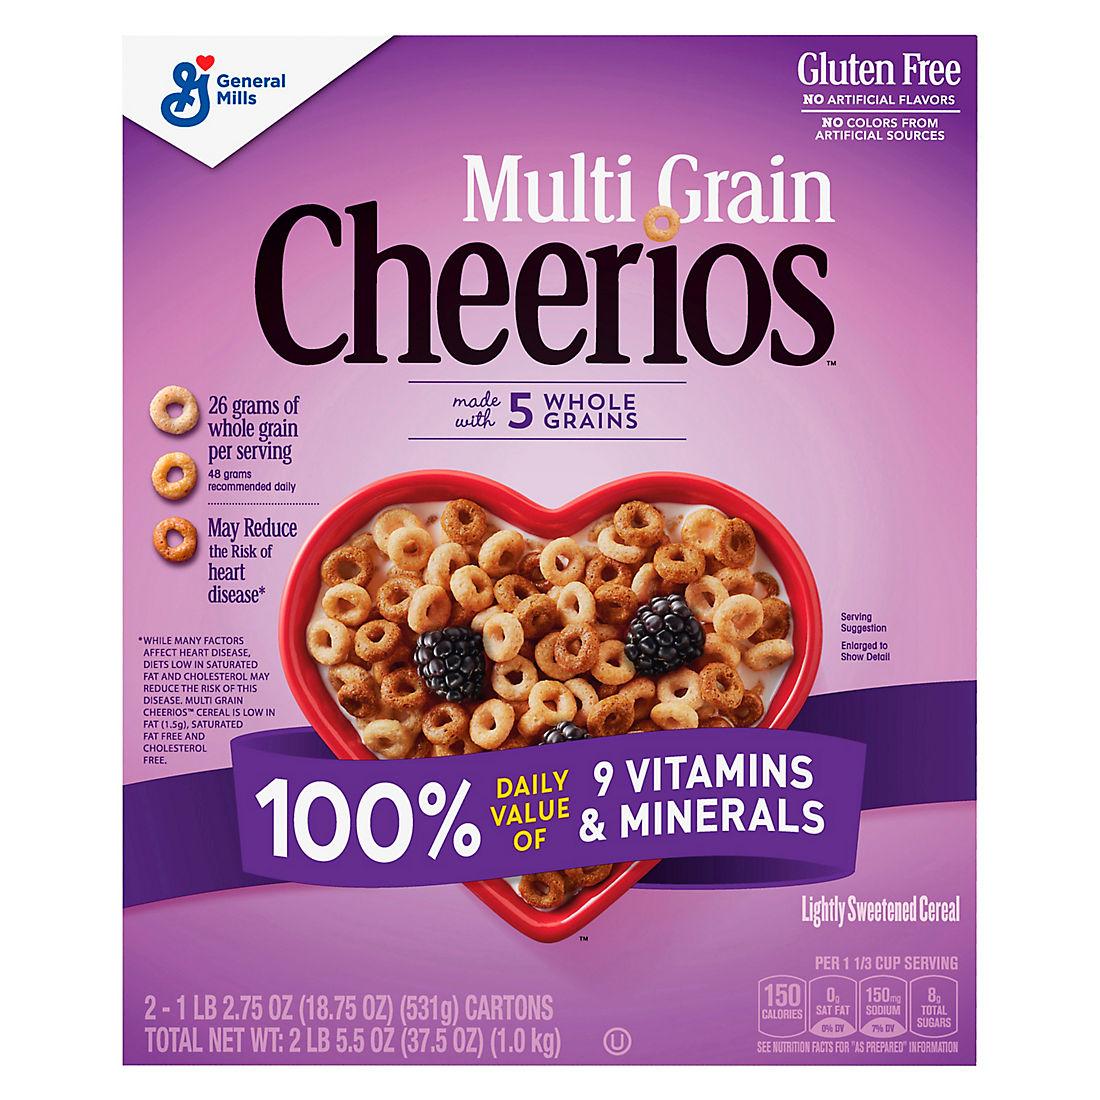 Multi-Grain Cheerios, 37.5 oz